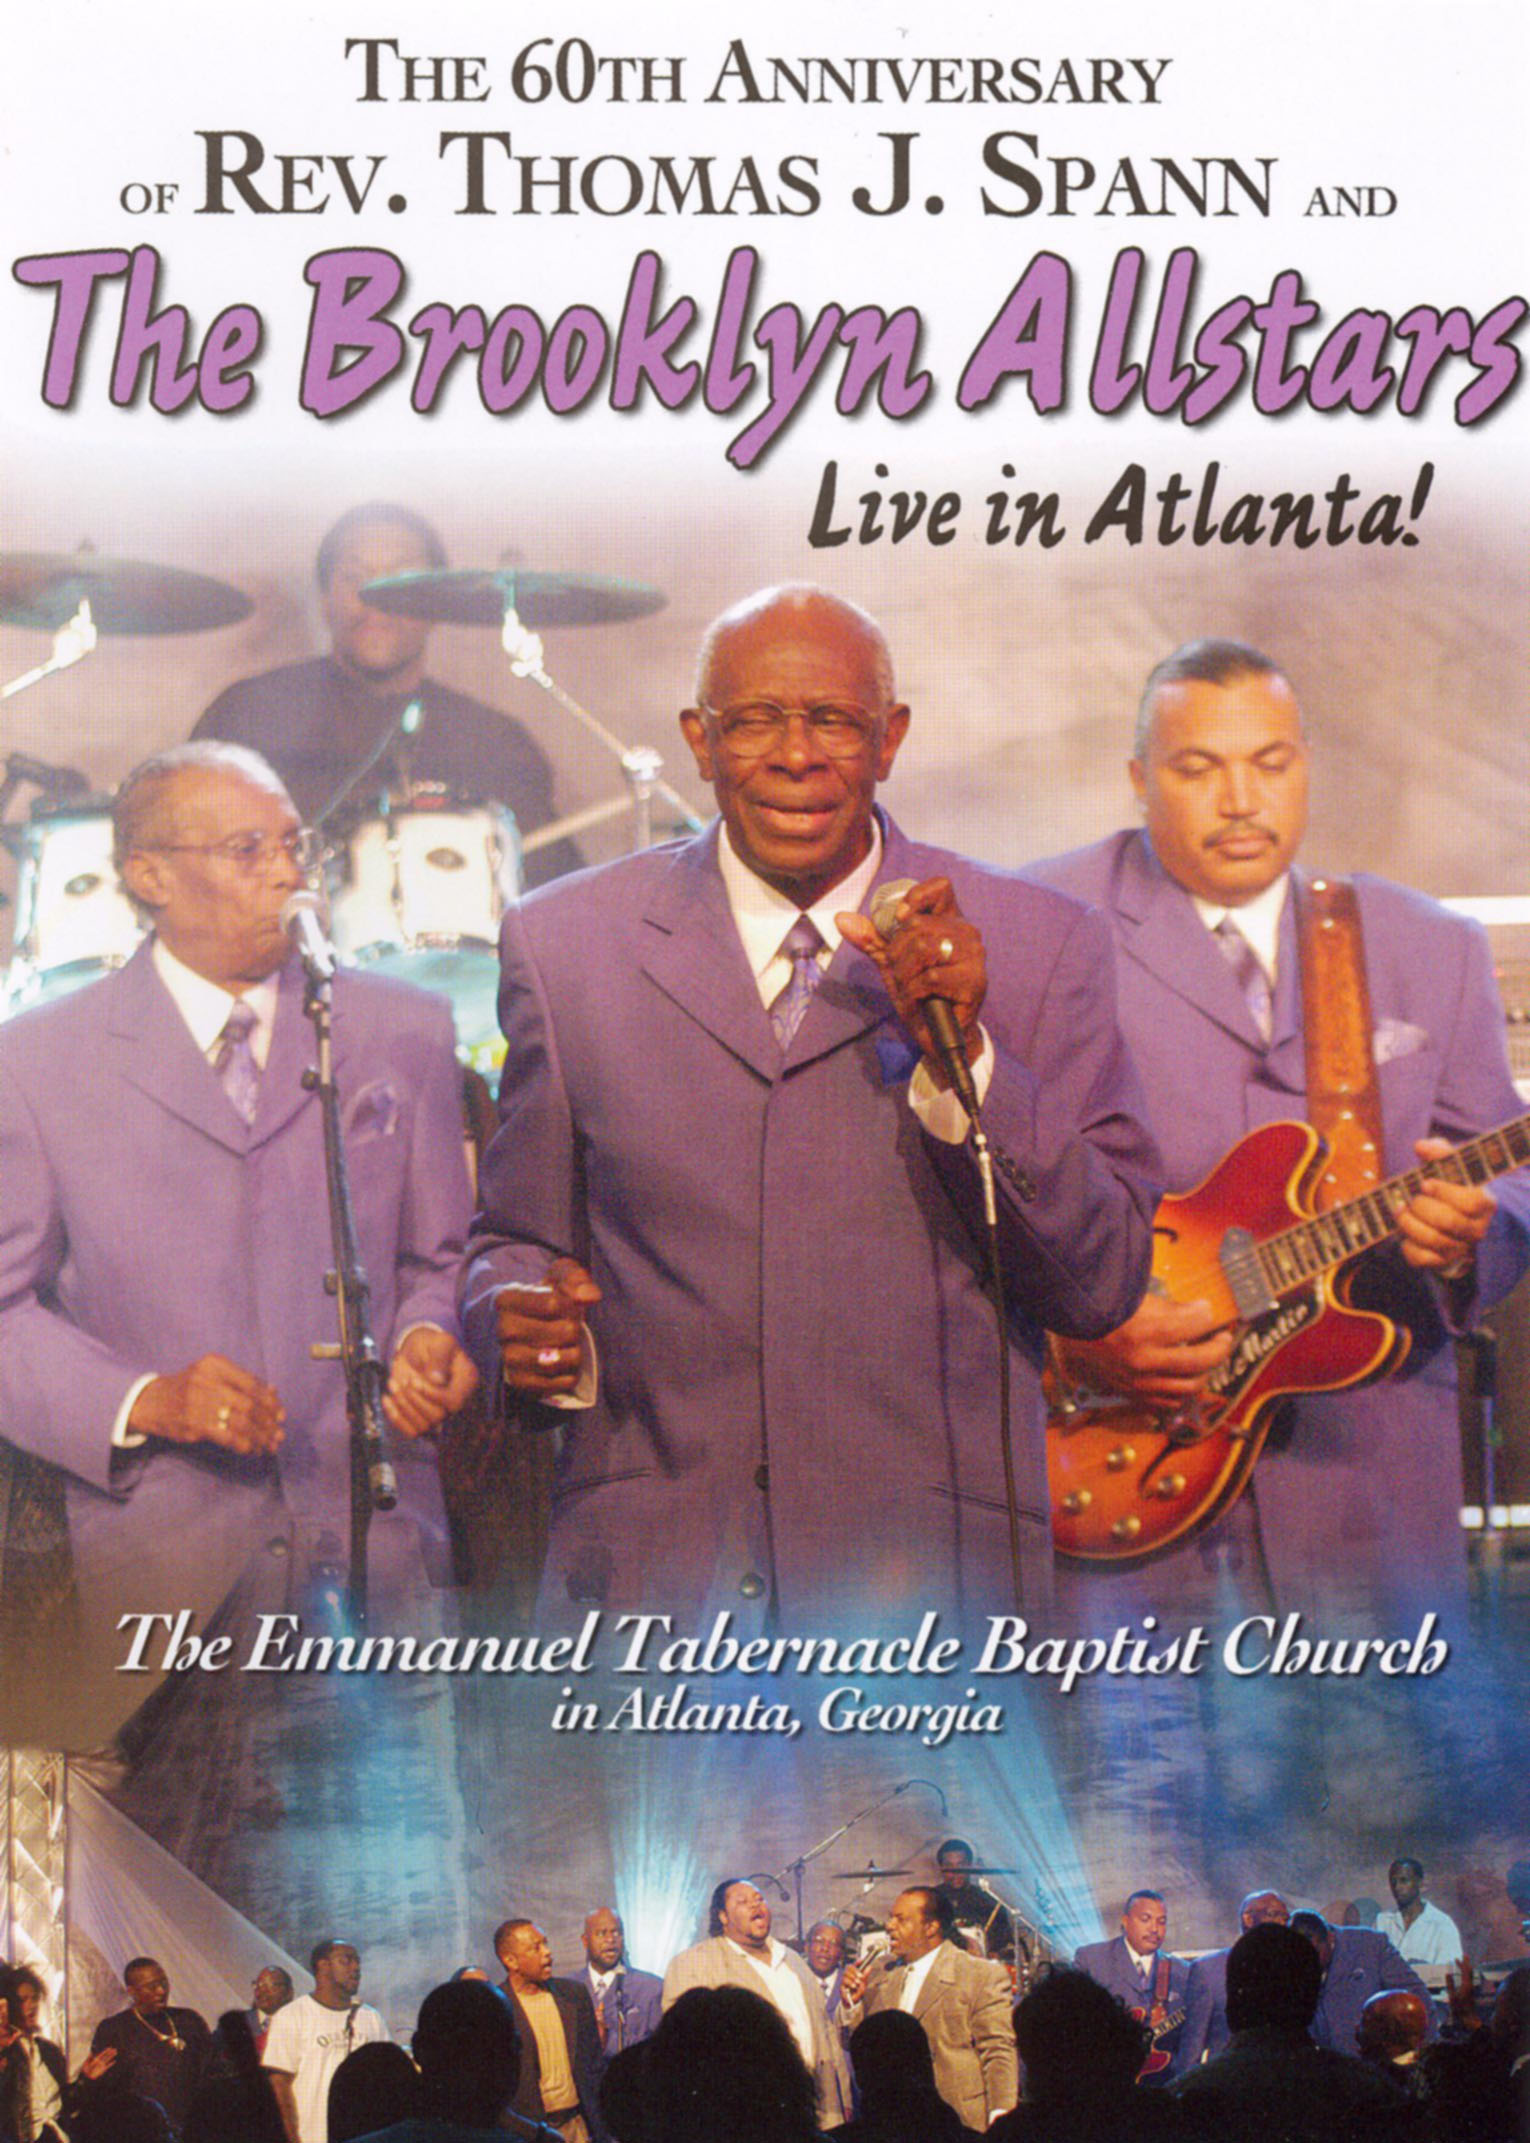 The Brooklyn Allstars: Live in Atlanta!